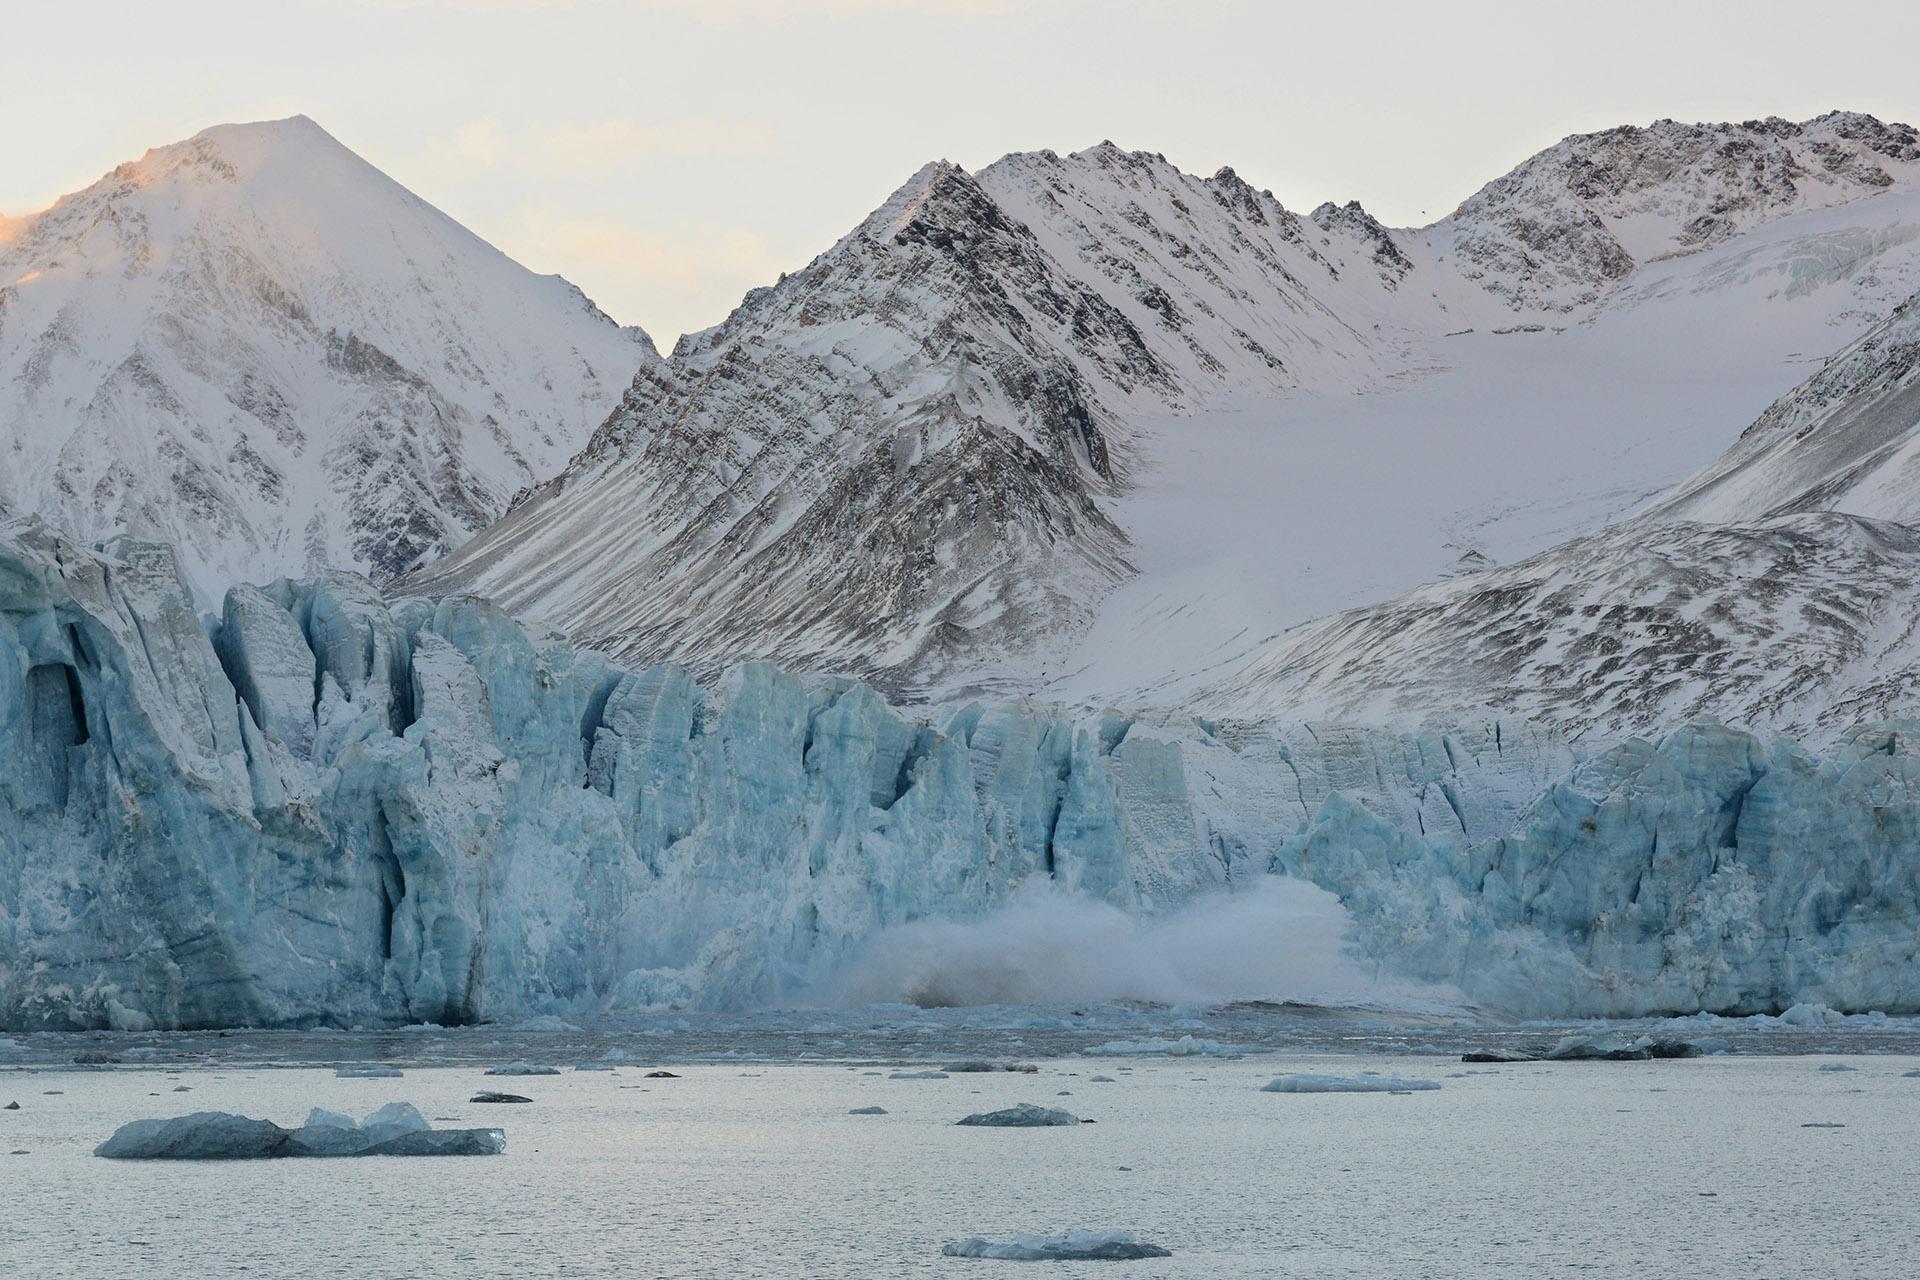 Kronebreen, Spitsbergen, Svalbard<br/>Impresión digital / Inject print